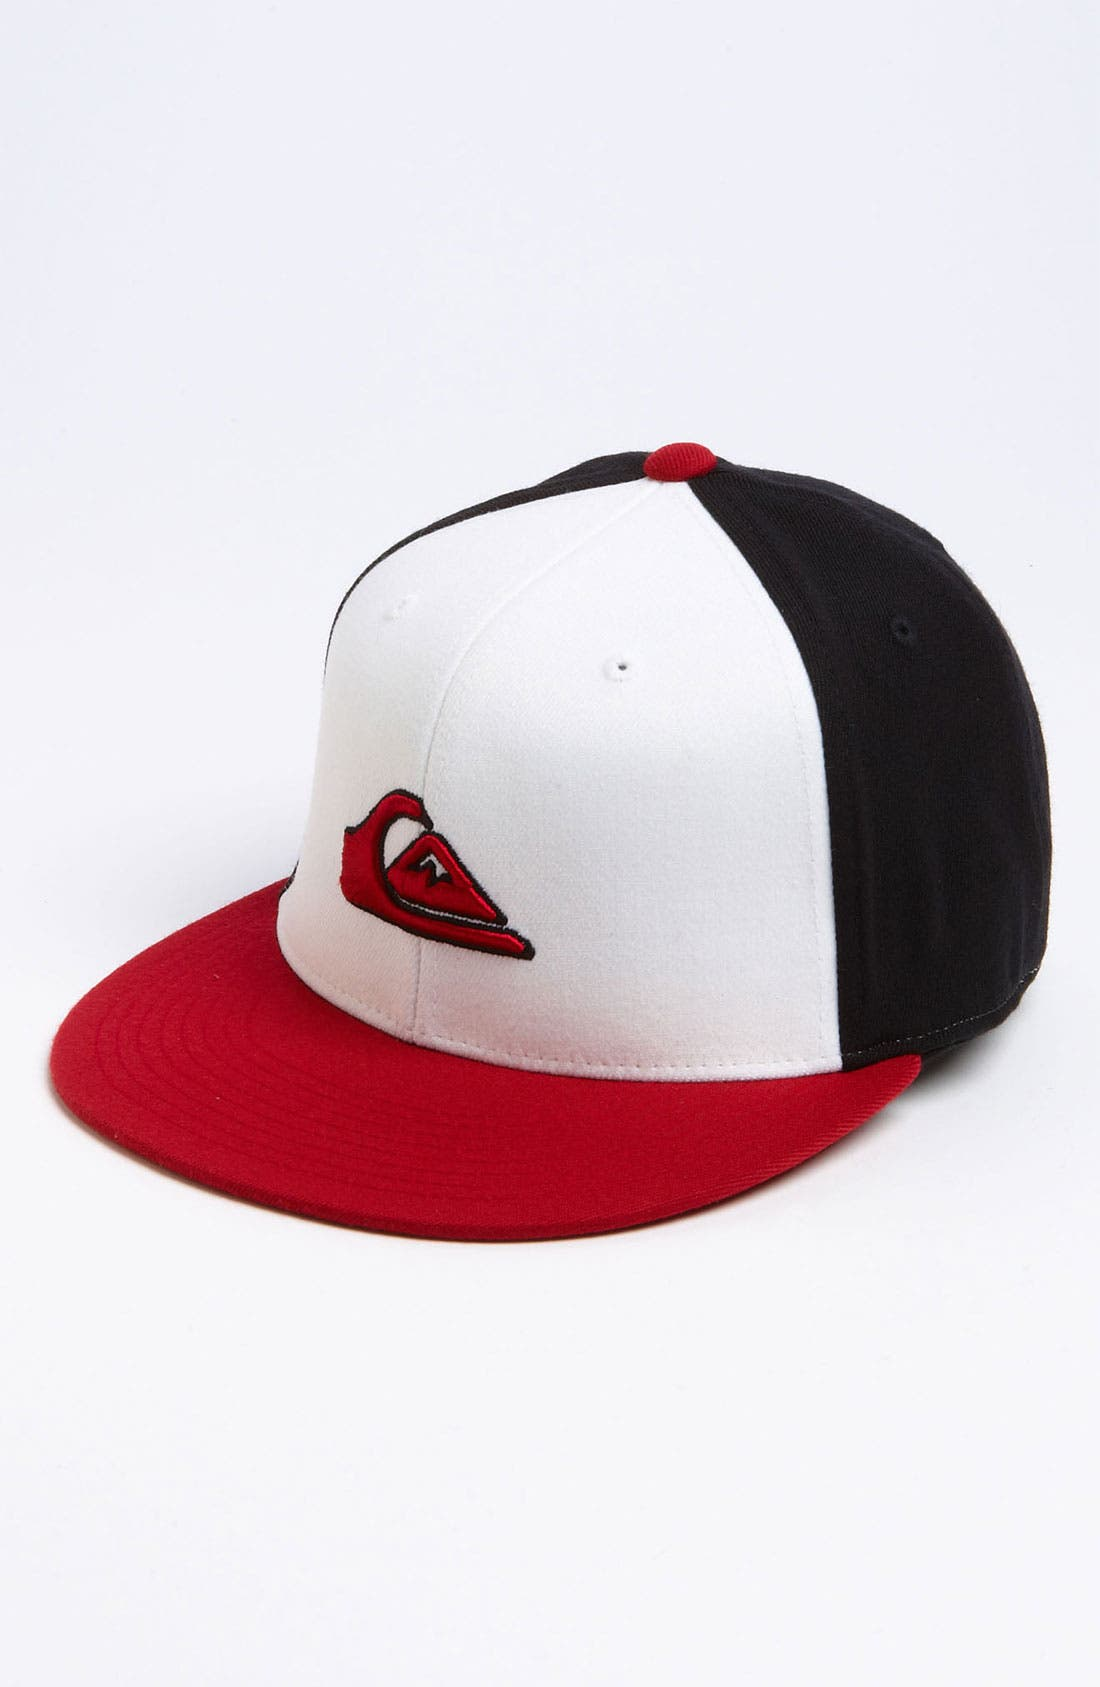 Main Image - Quiksilver 'Yea Yea' Fitted Baseball Cap